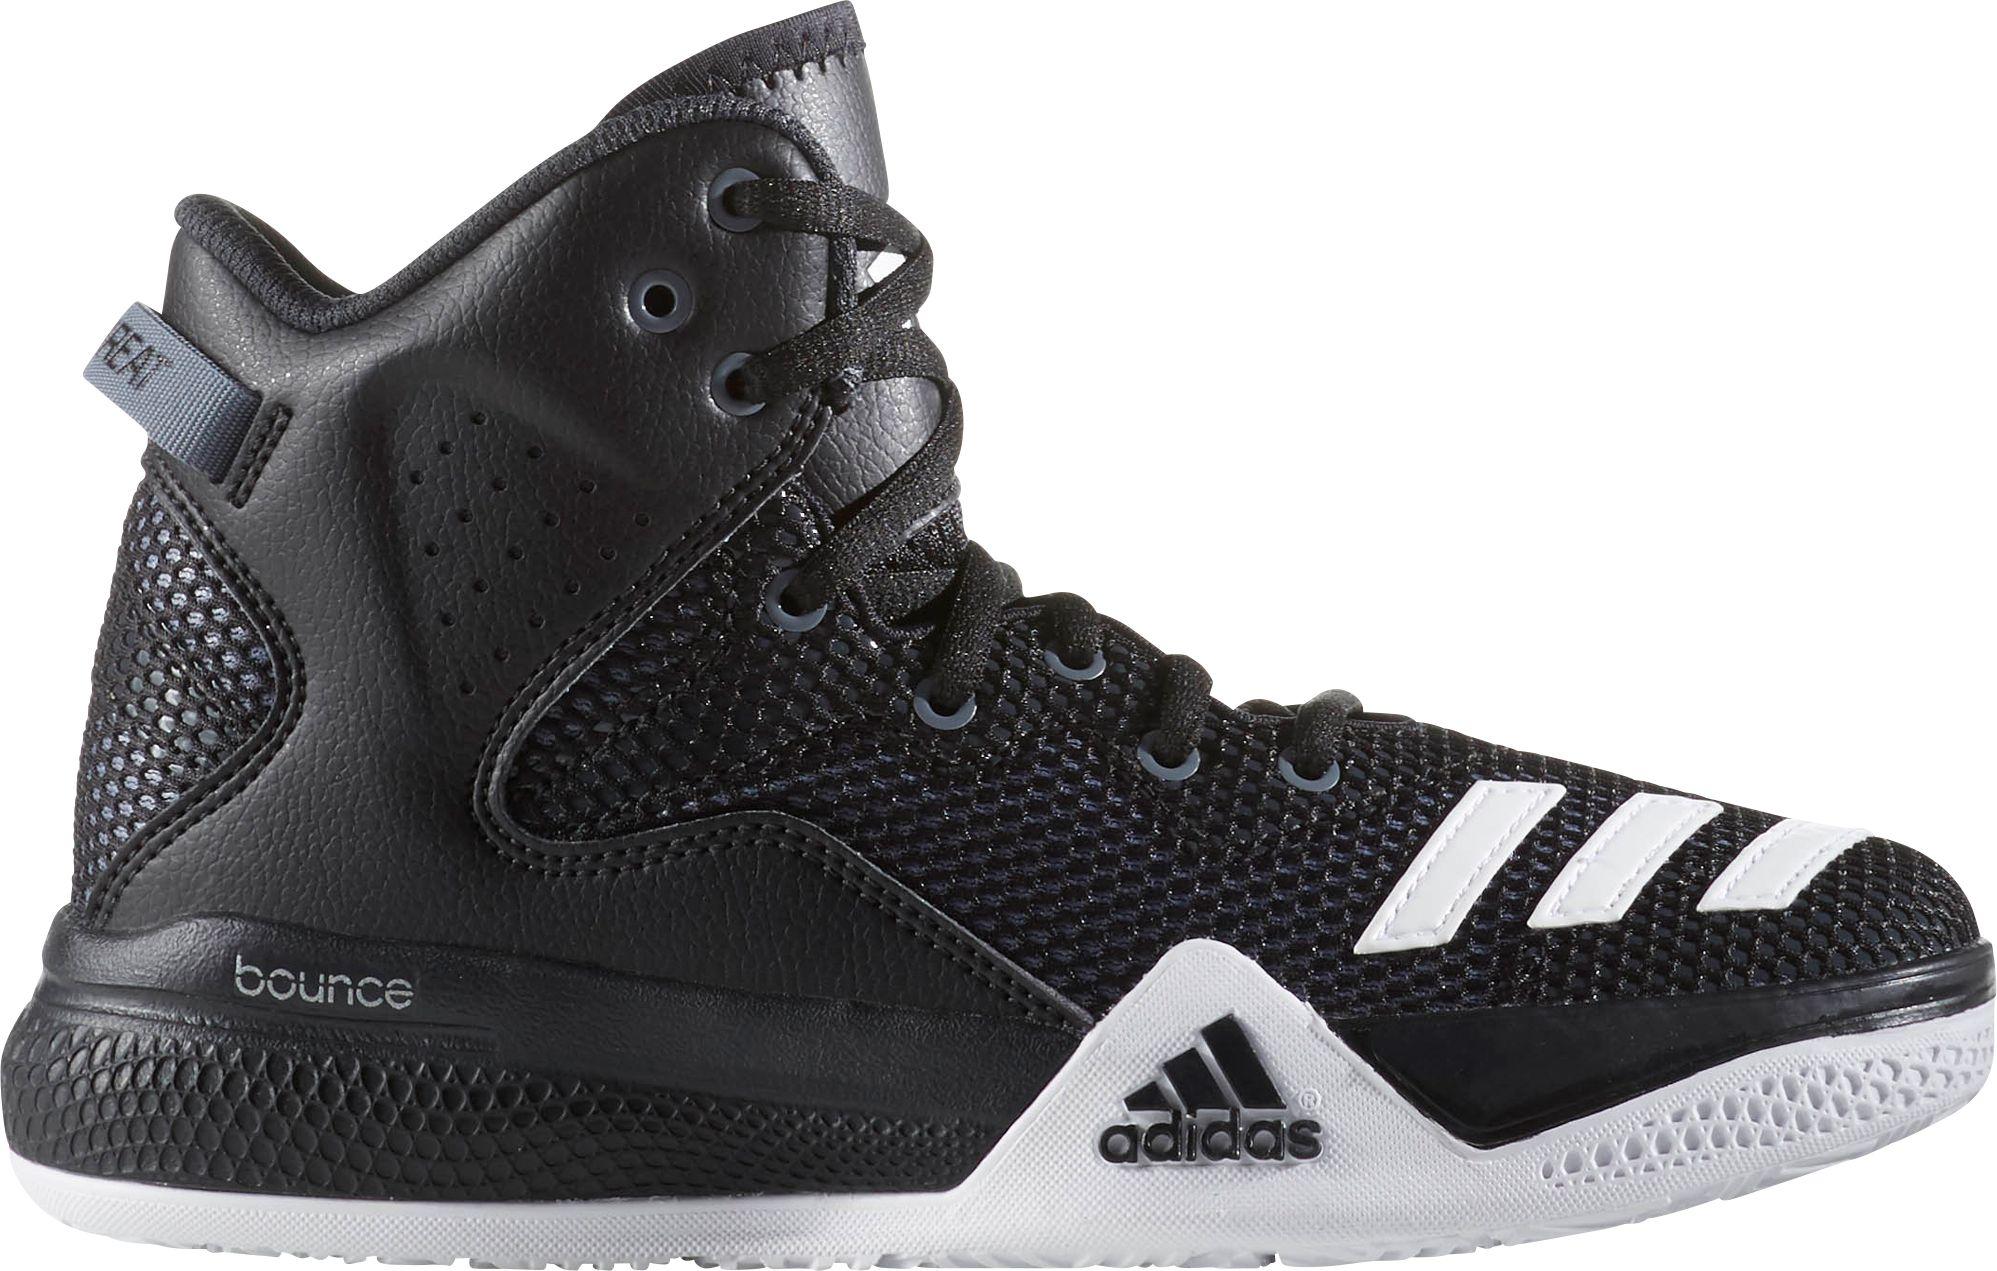 adidas menu0027s dual threat basketball shoes TXILTFQ